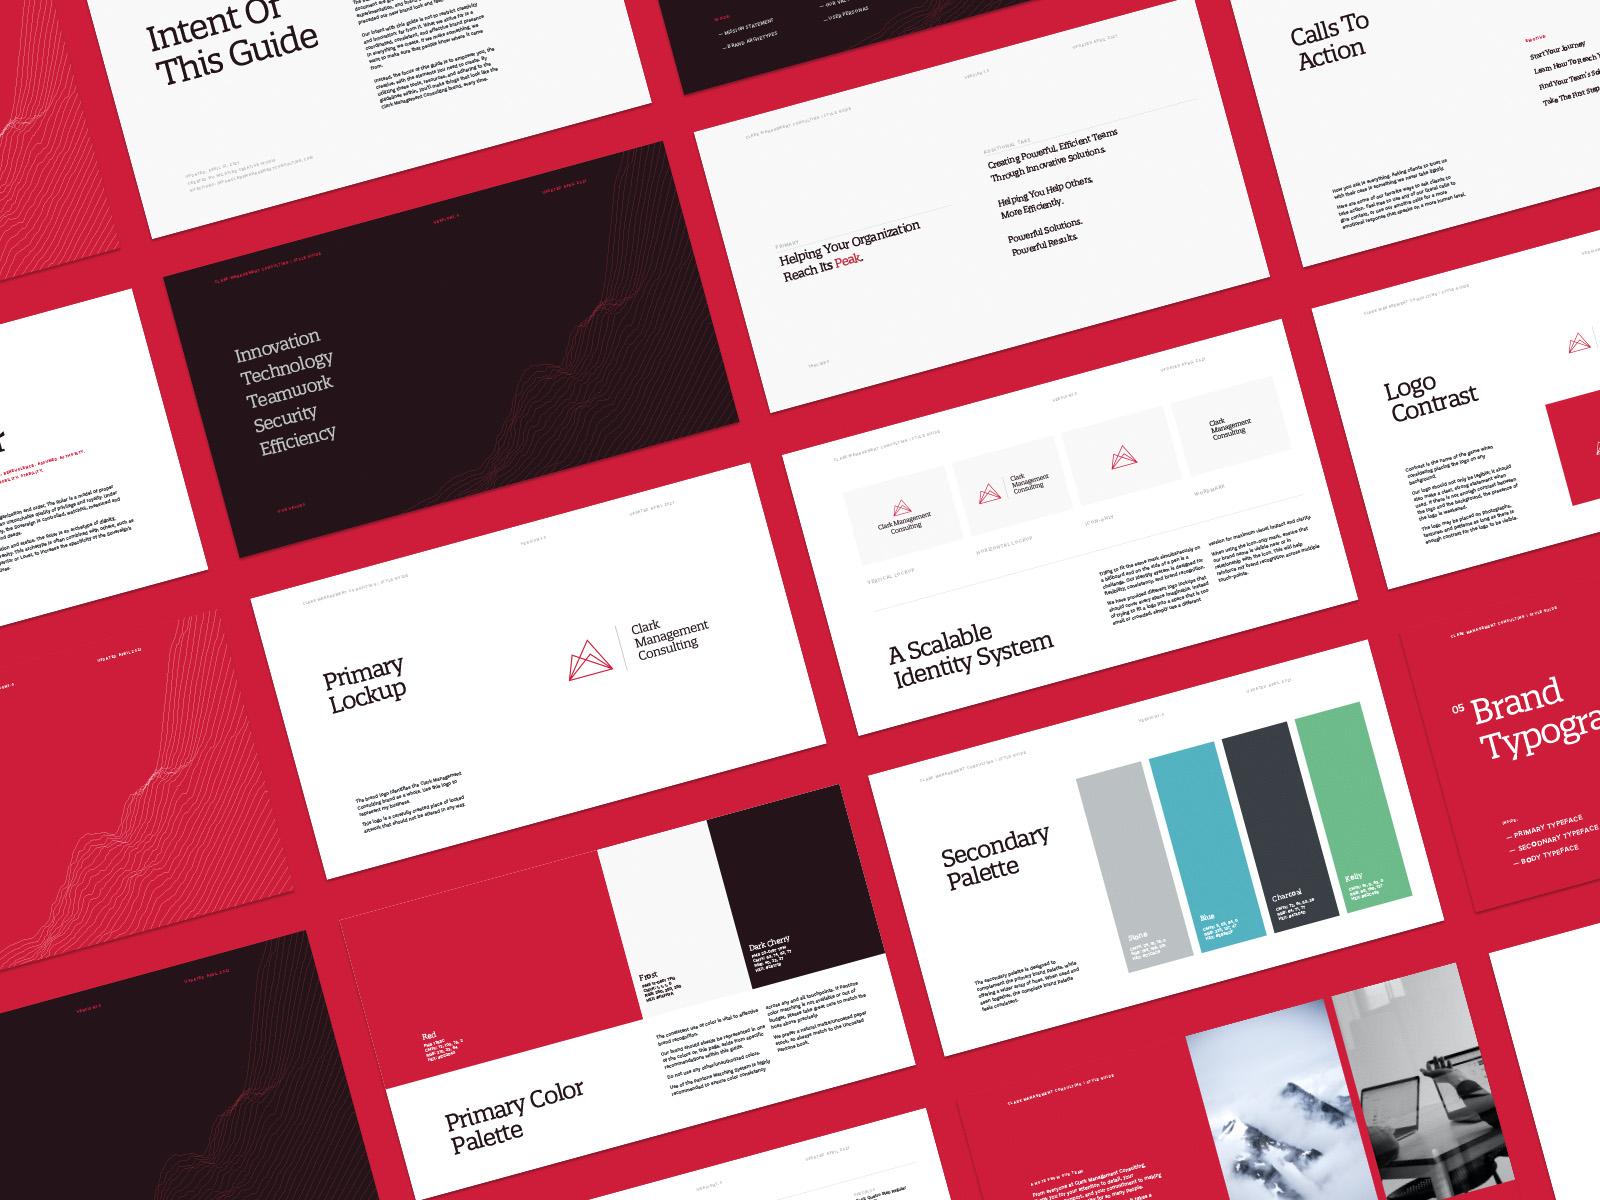 Clark Management Consulting | Brand Identity